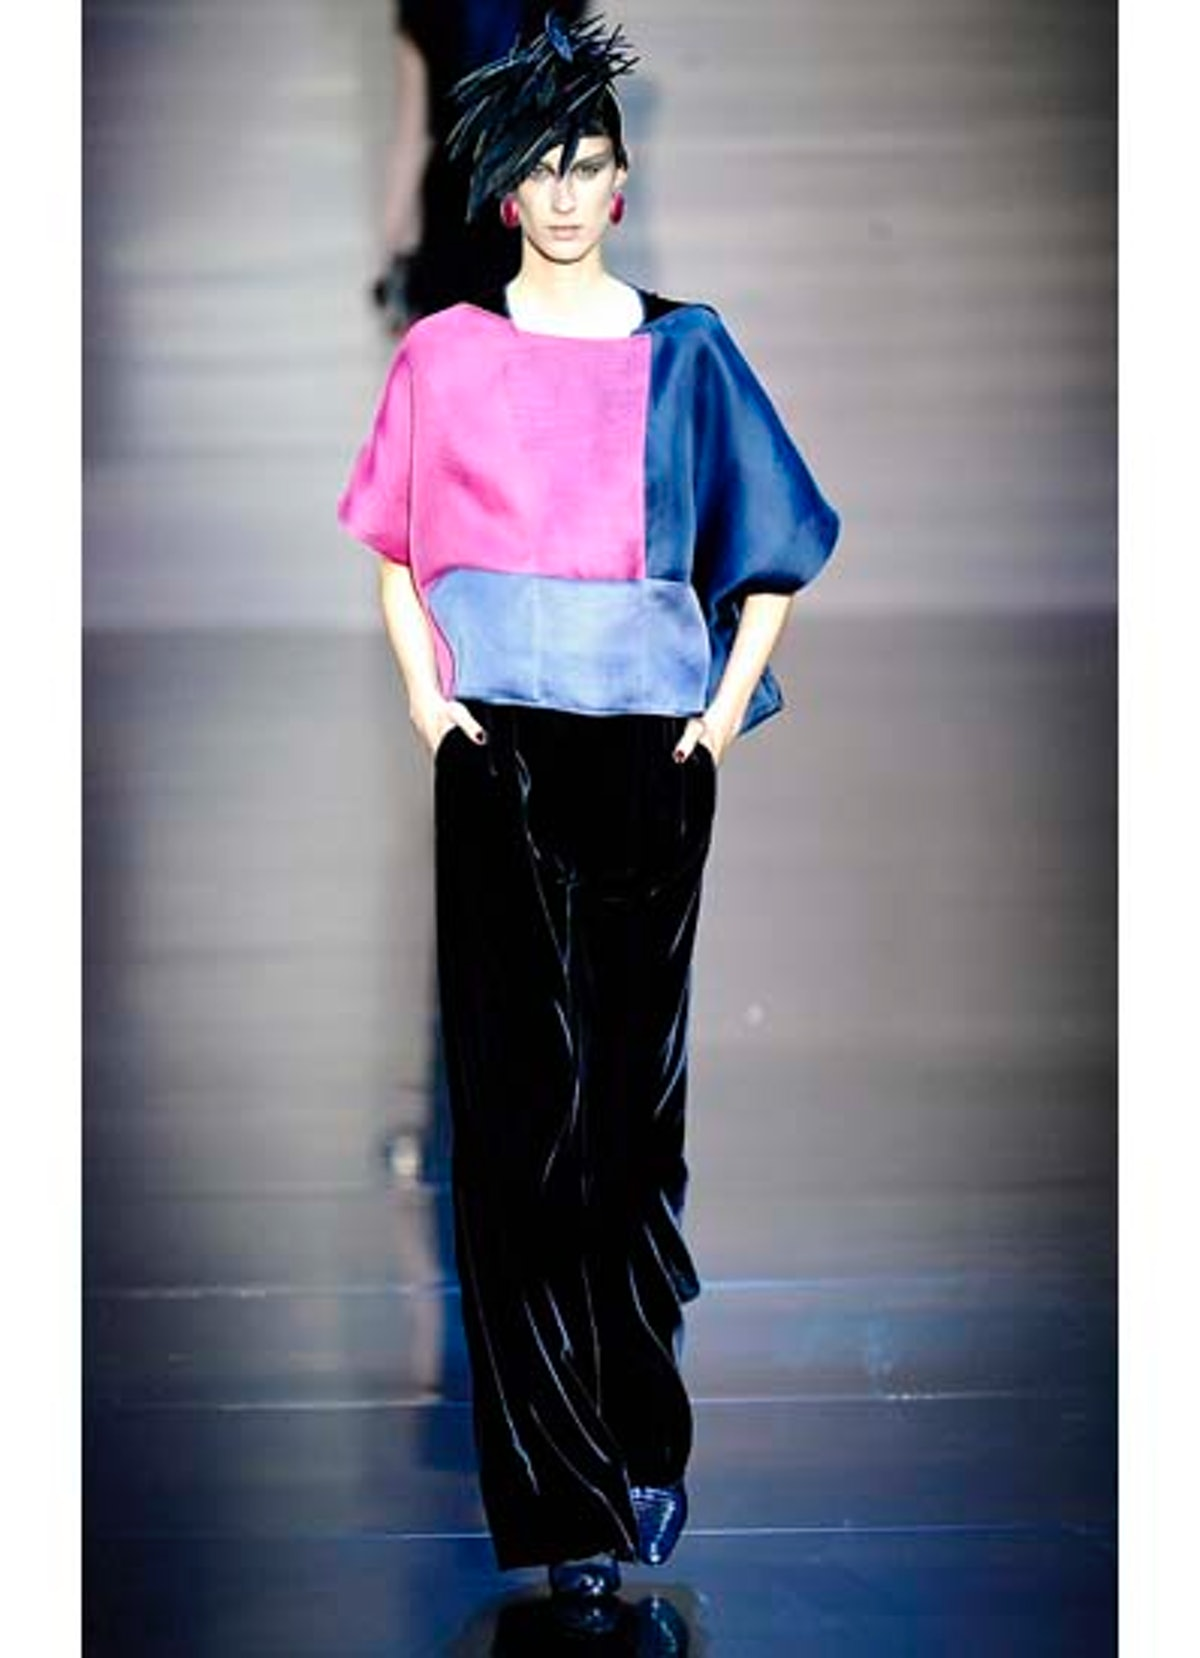 fass-giorgio-armani-couture-2012-runway-28-v.jpg